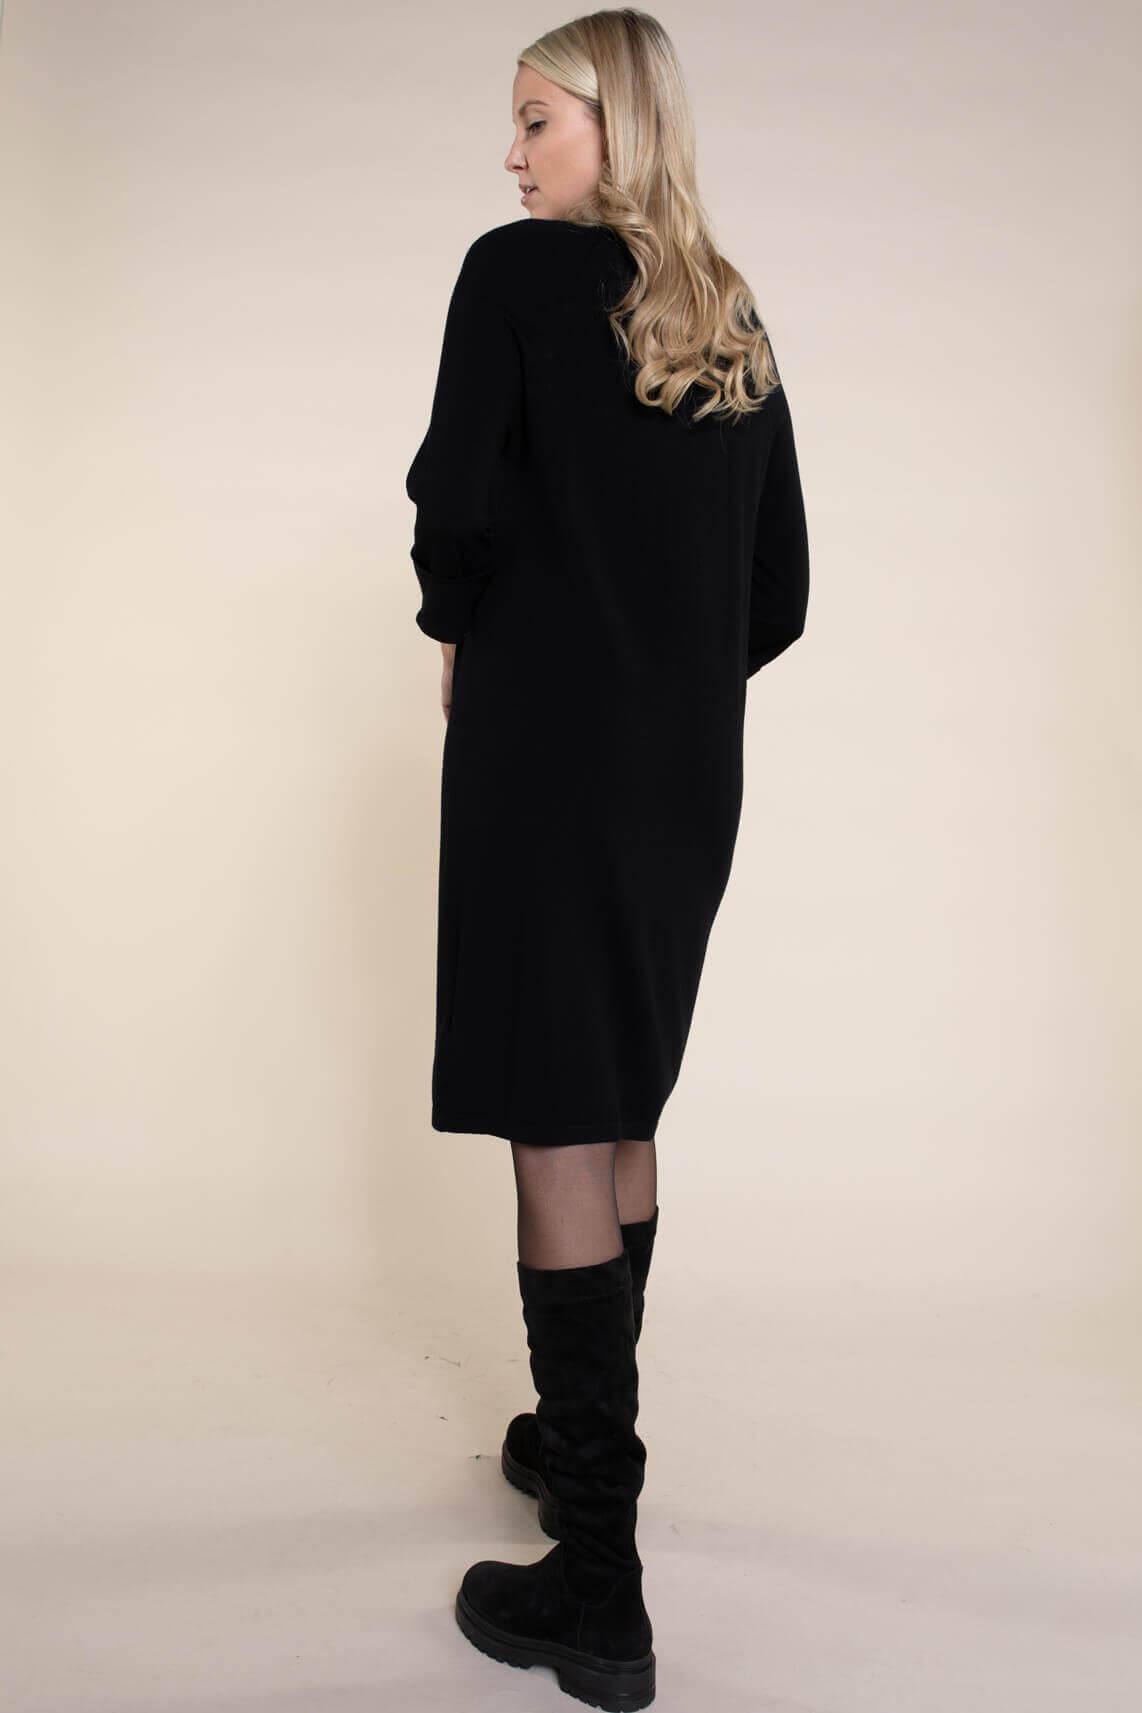 Anna Dames Gebreide jurk zwart